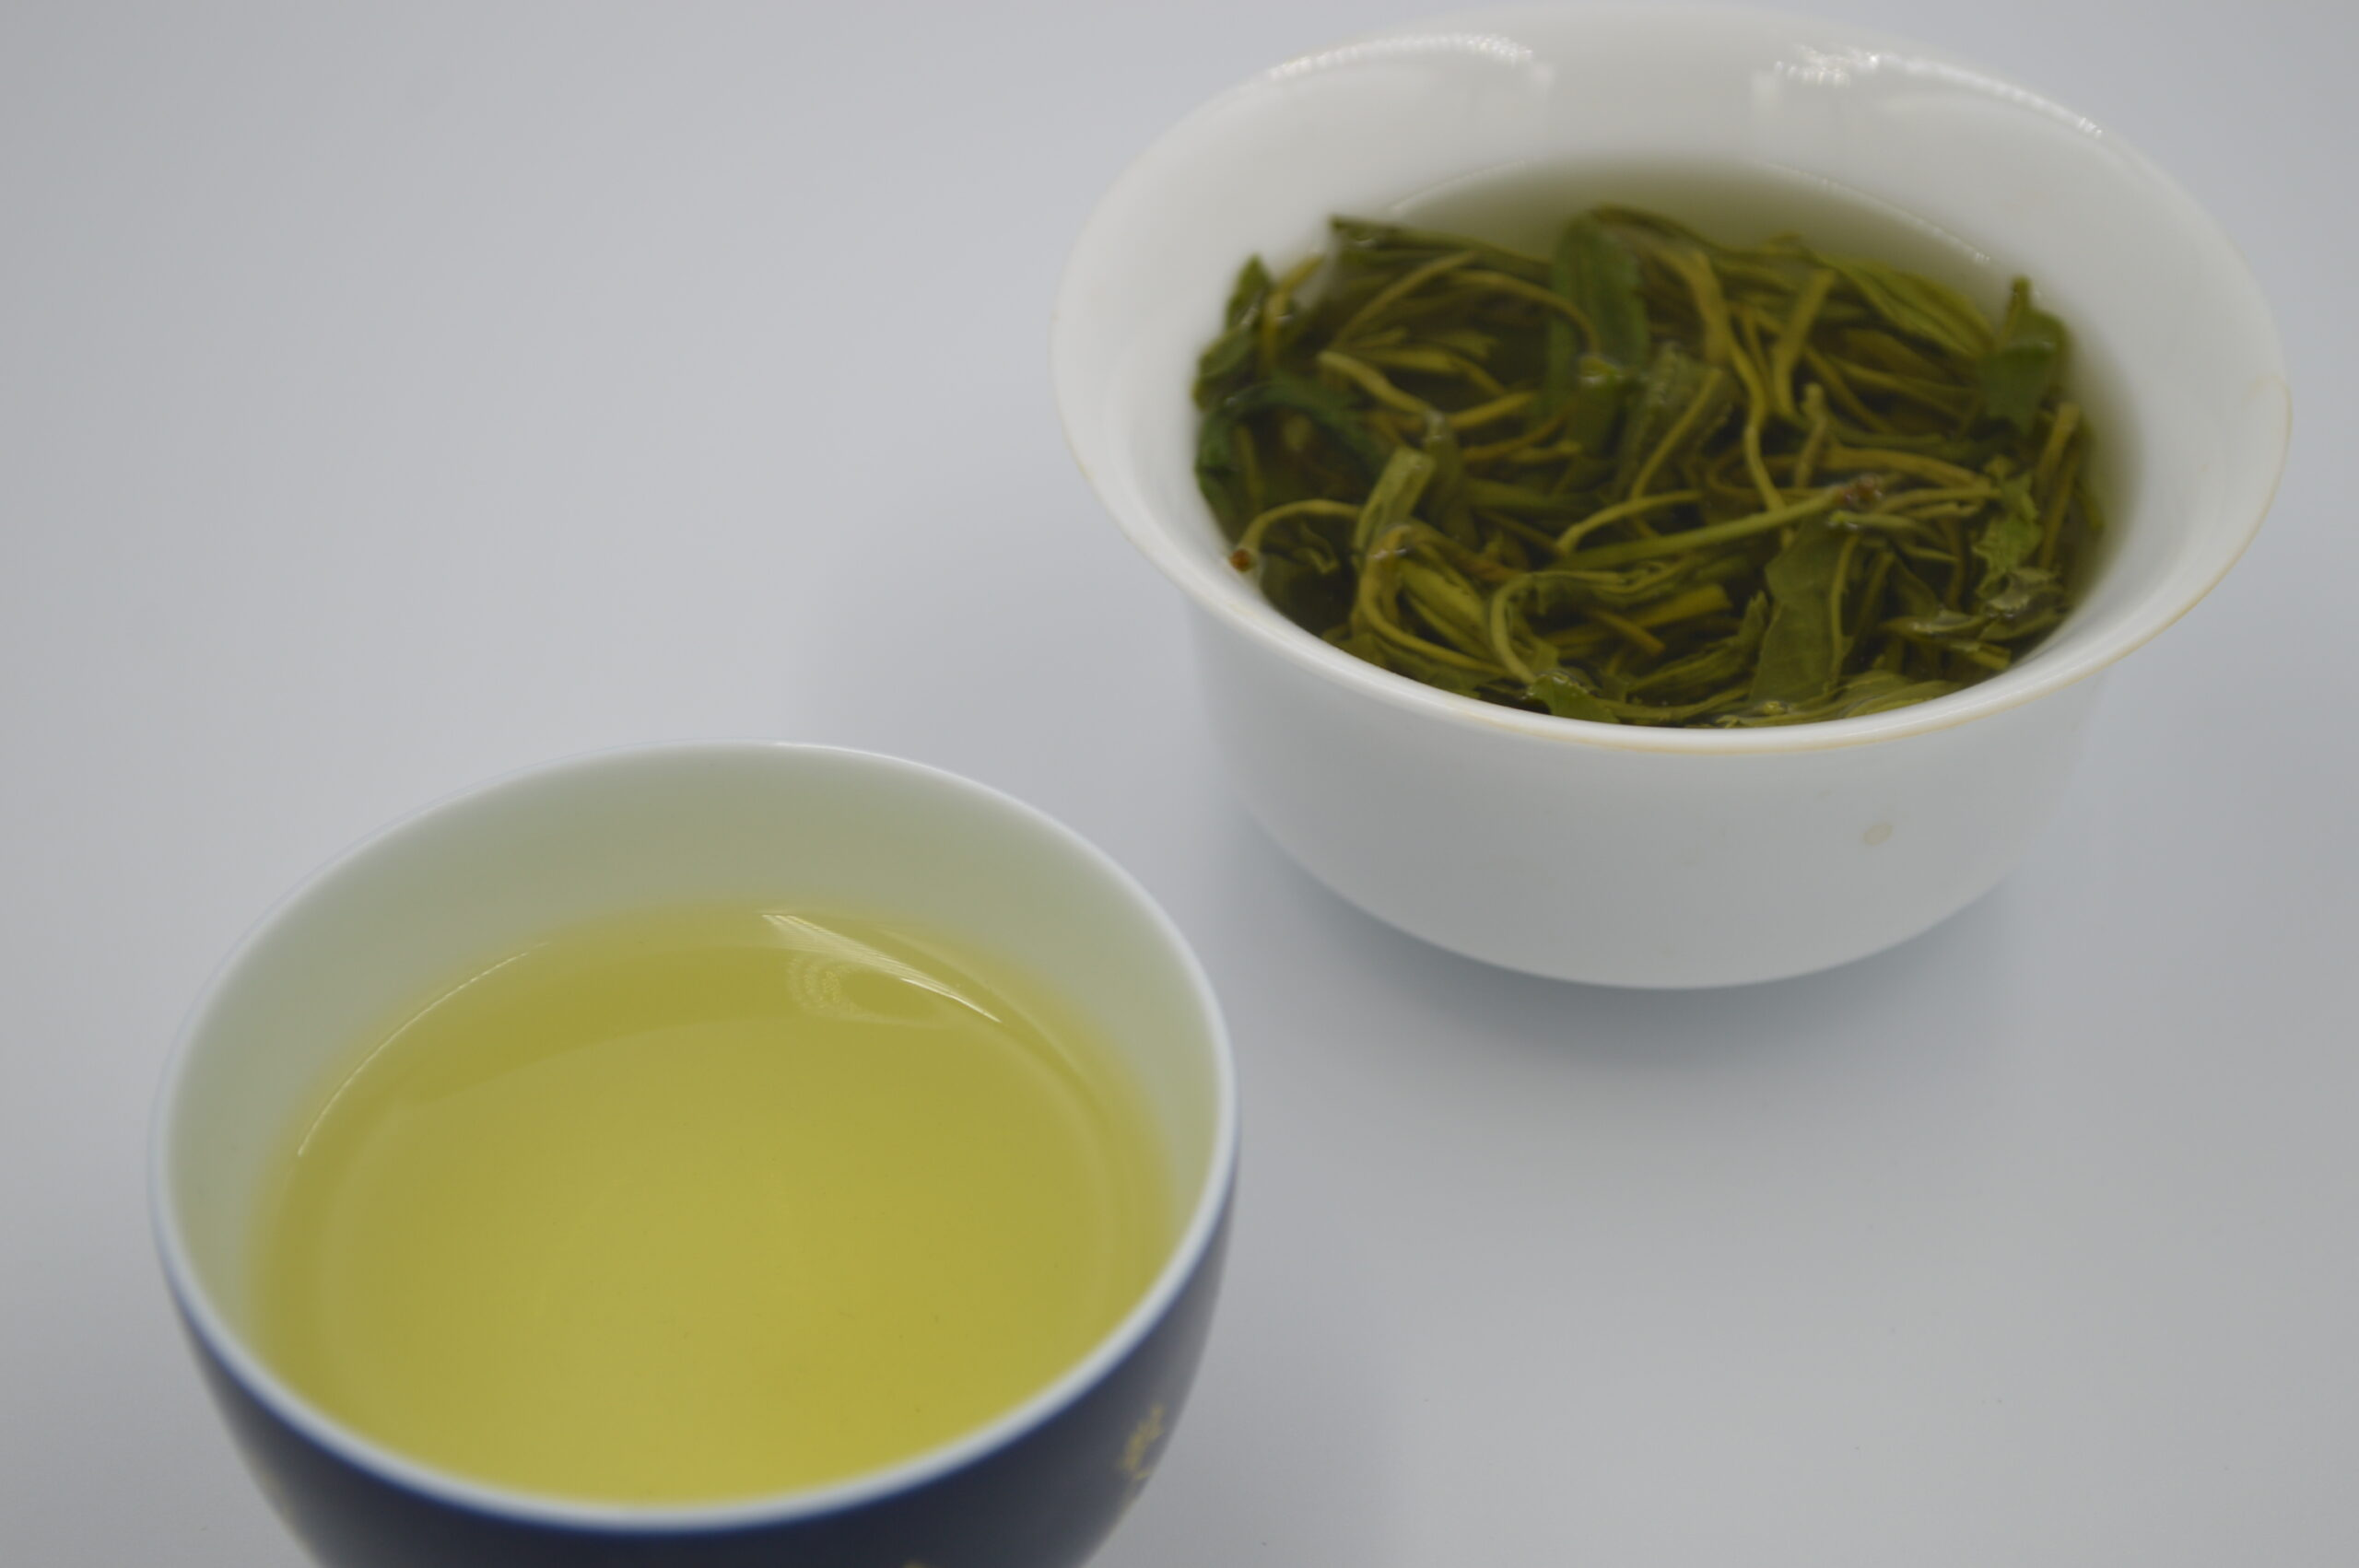 https://shop.liu-tea-art.com/wp-content/uploads/2019/04/DSC_0080-scaled.jpg